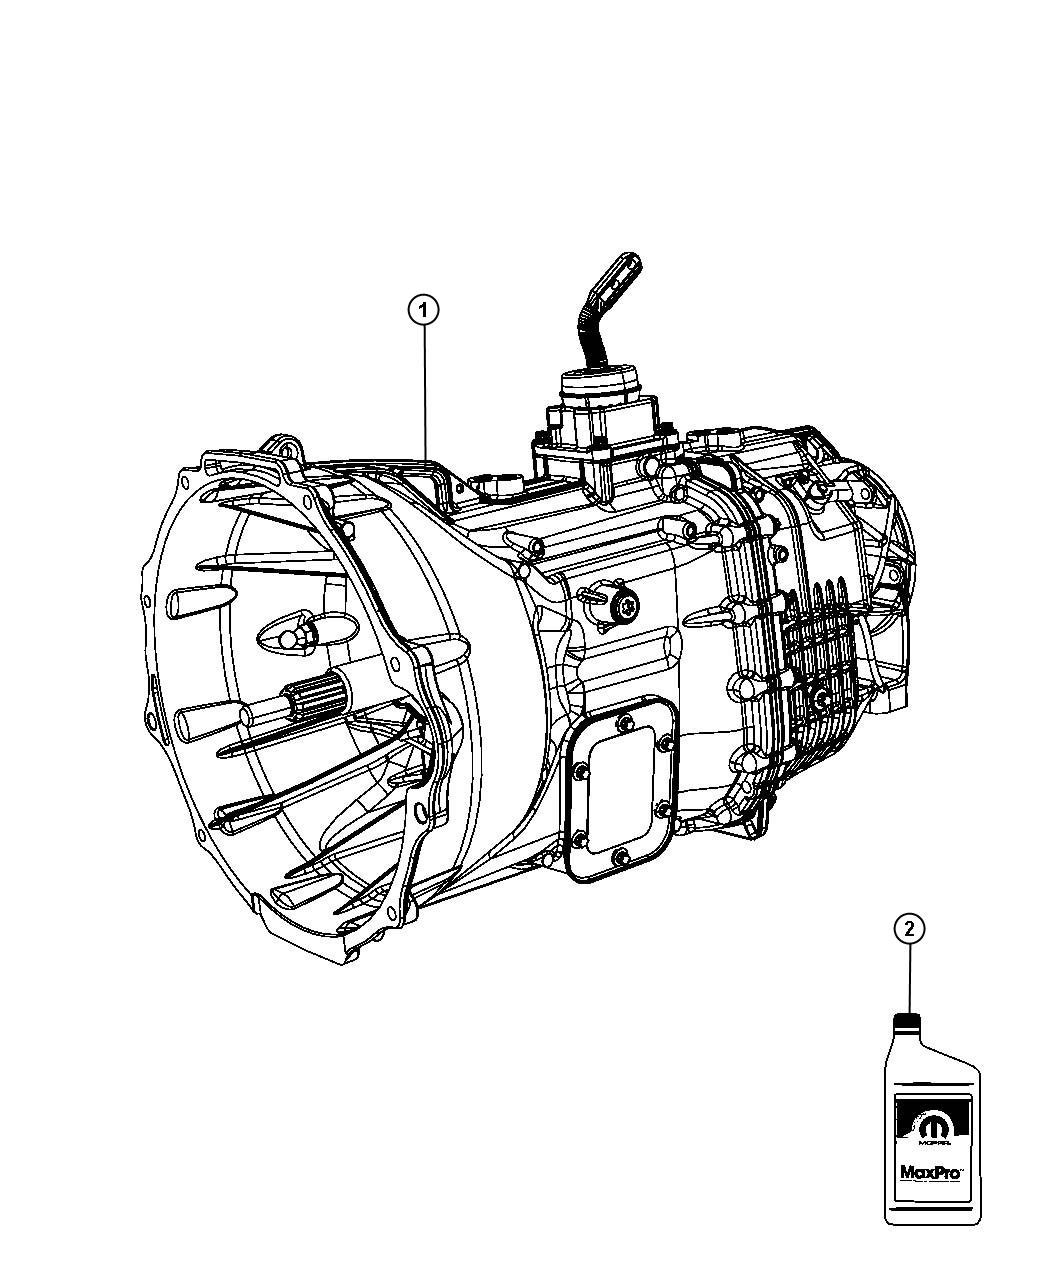 Ram Transmission 6 Speed